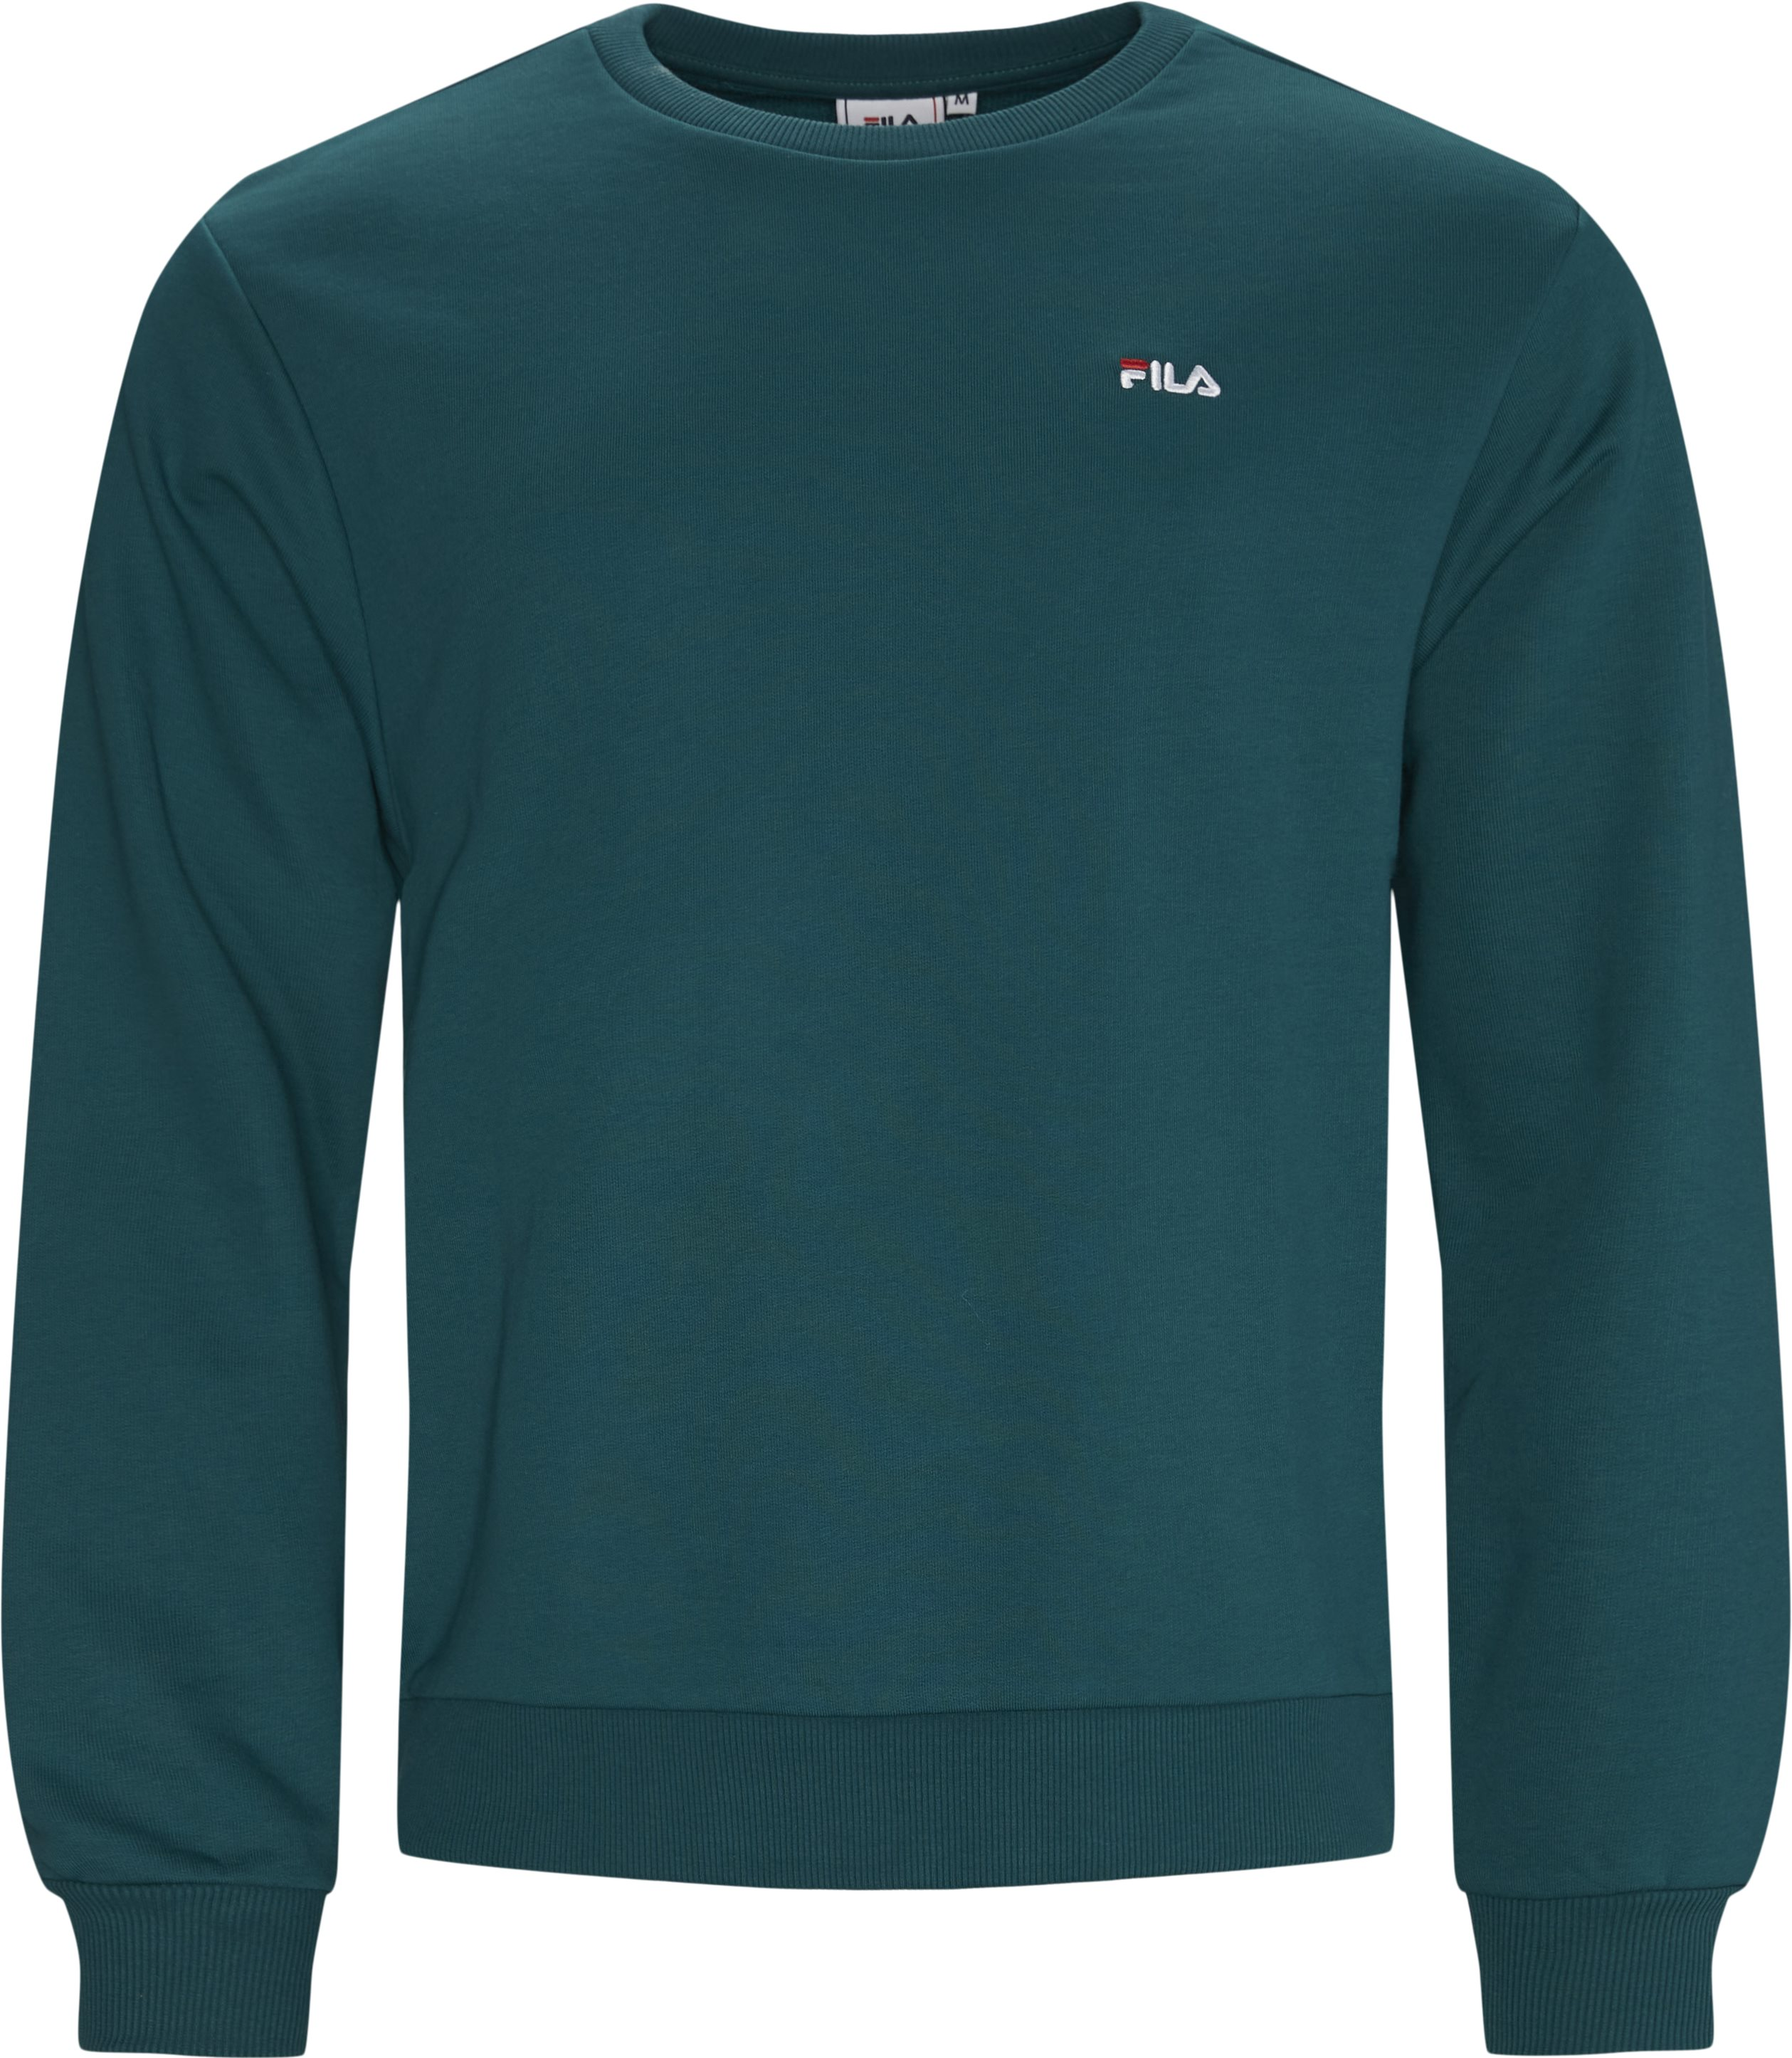 Efim Crewneck Sweatshirt - Sweatshirts - Regular fit - Grøn